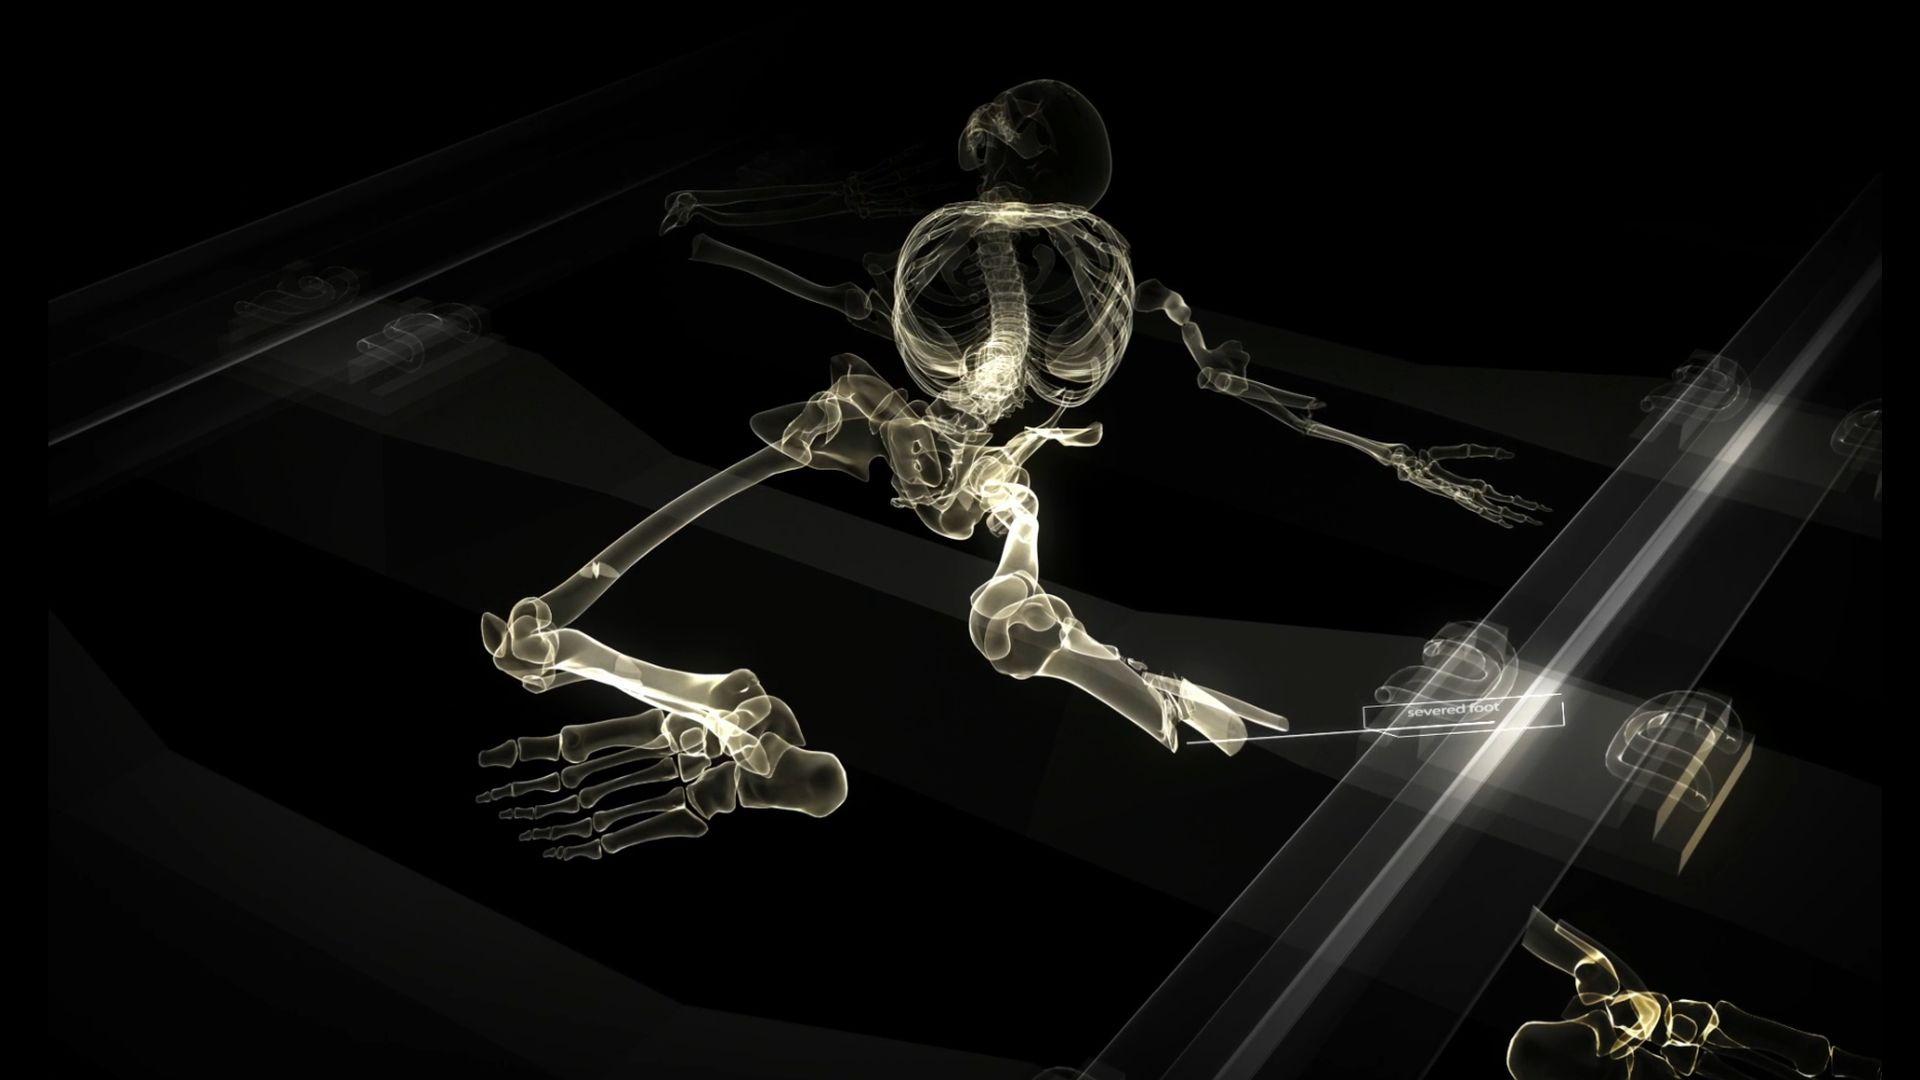 X-Ray body